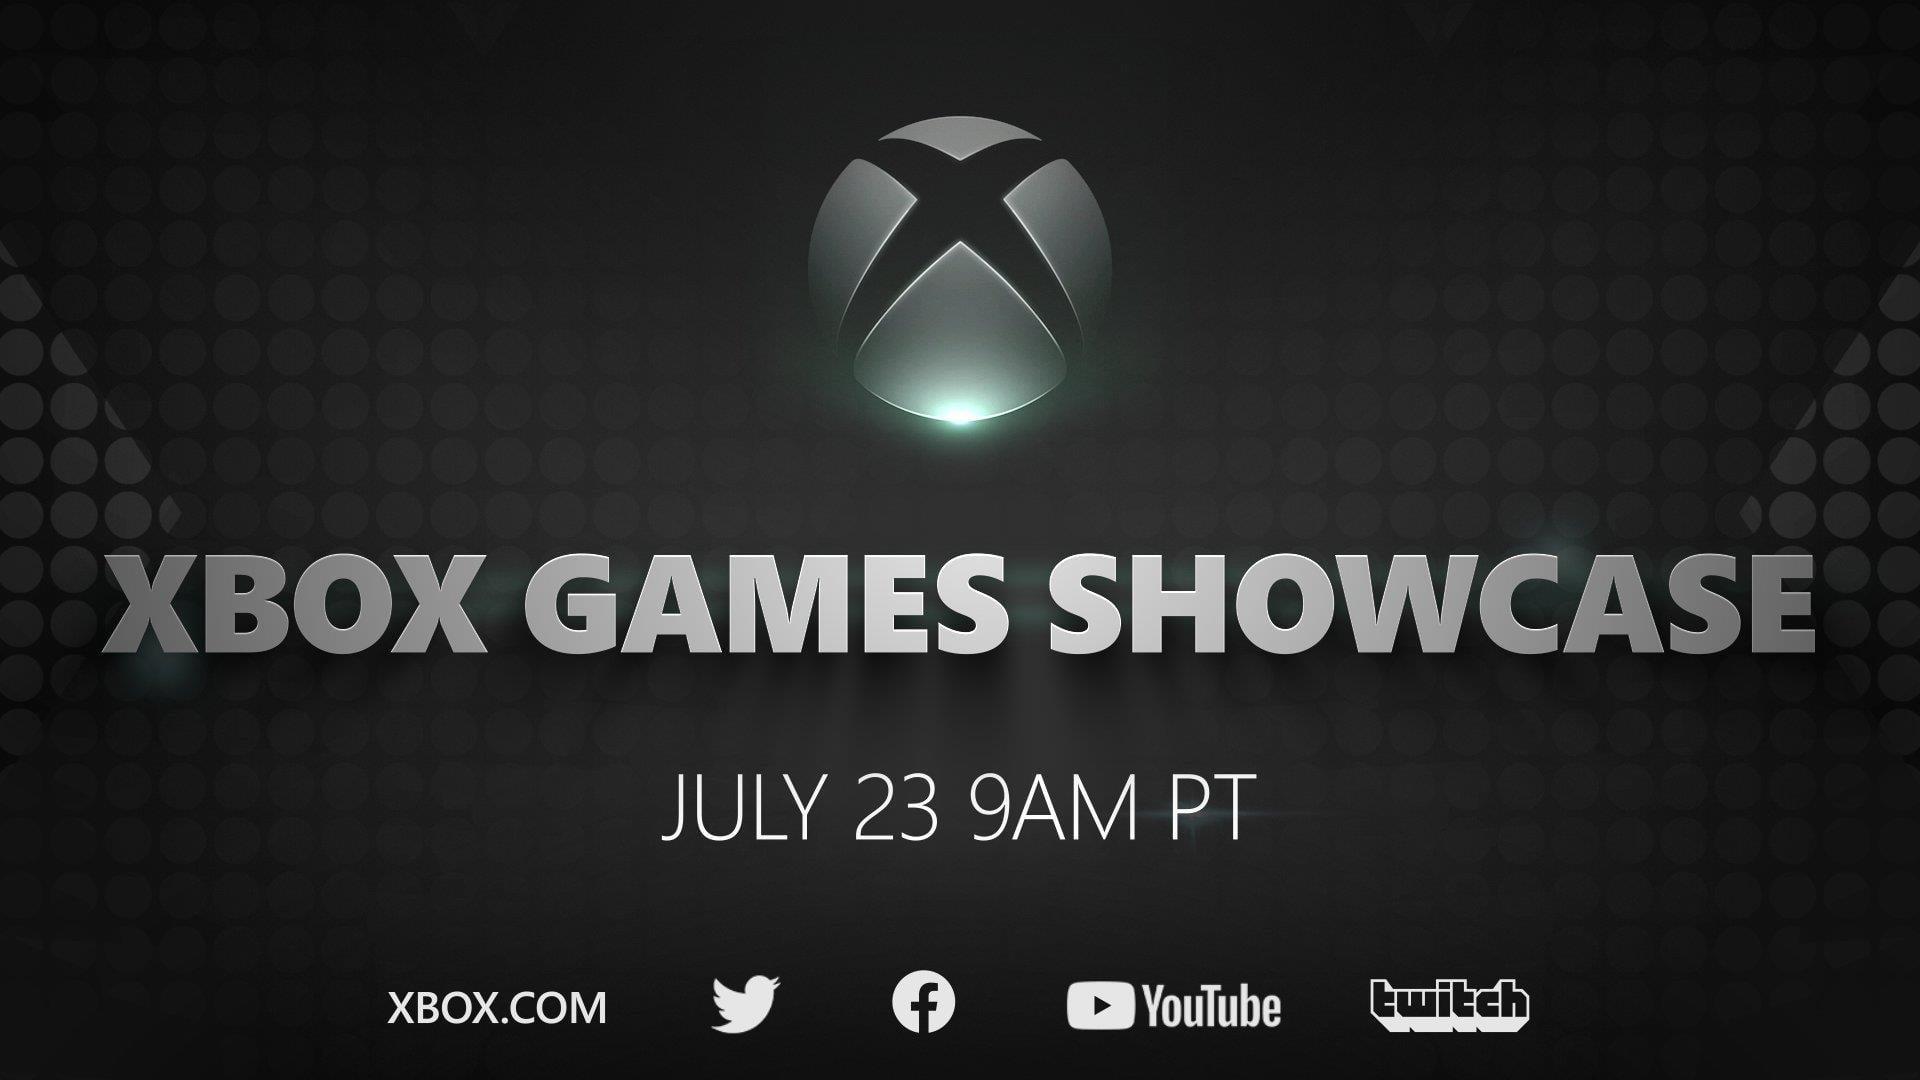 Xbox Games Showcase July 23 Stream - Watch Halo Infinite Gameplay!